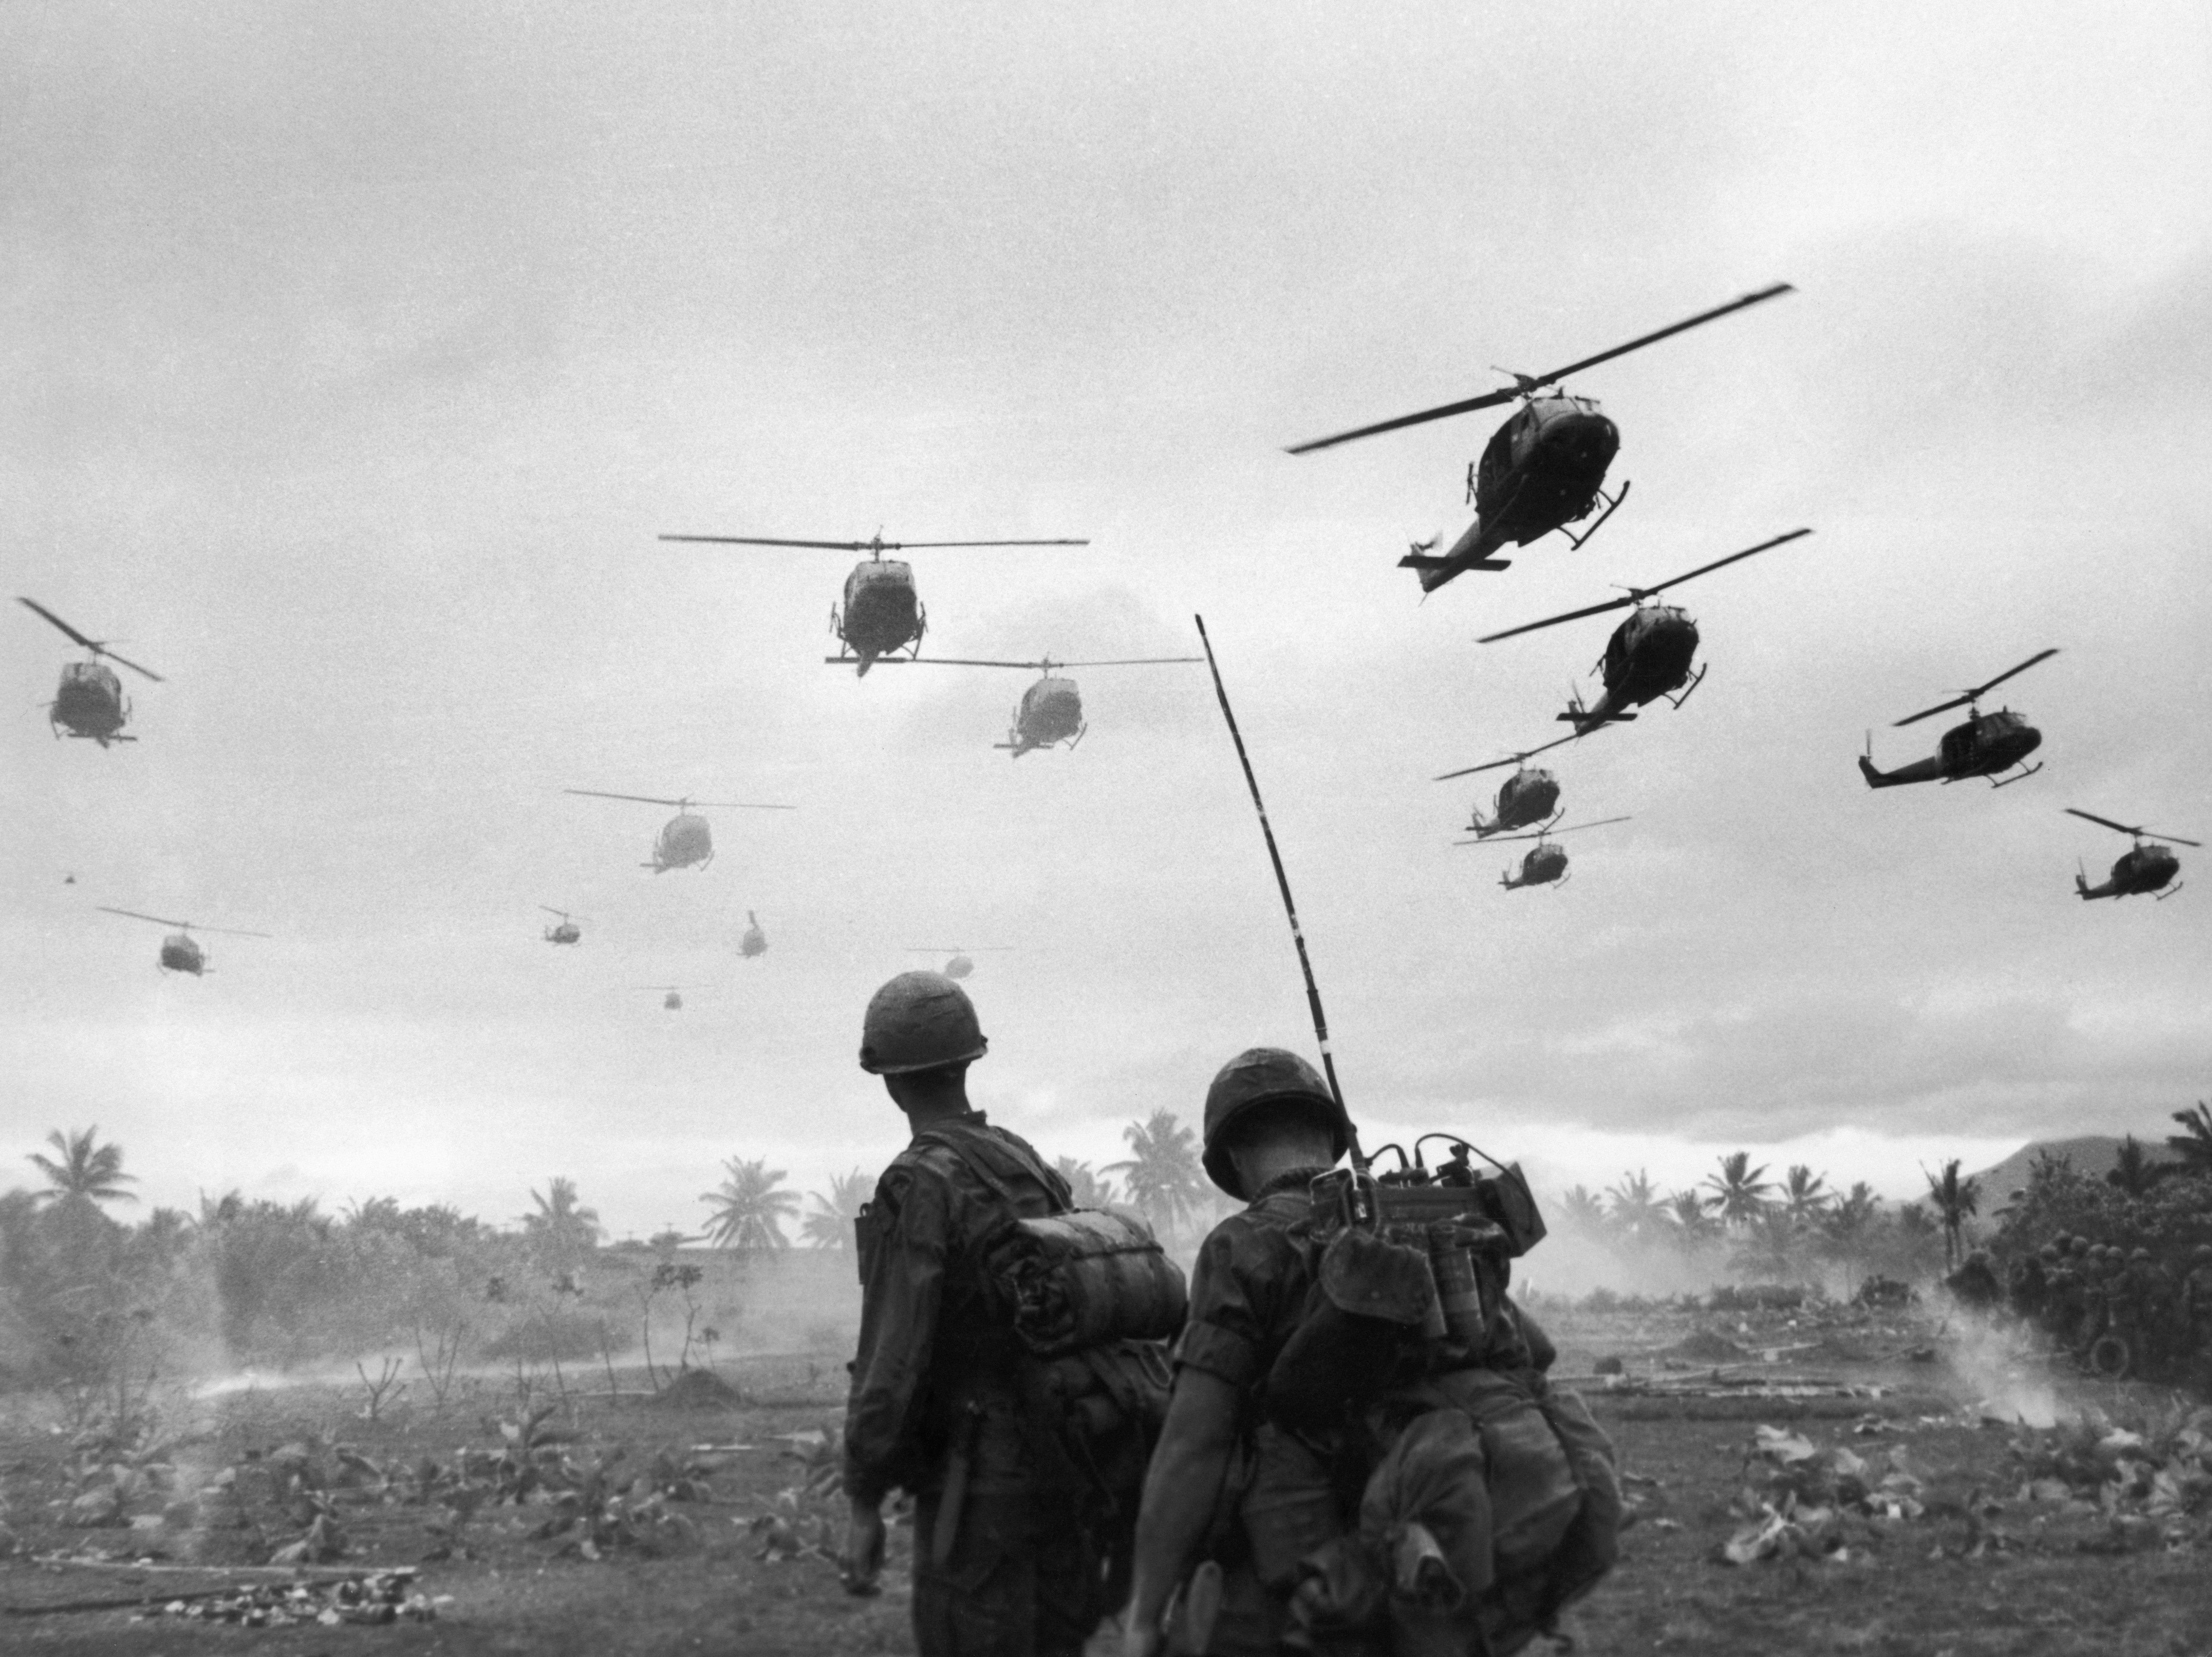 Vietnam War Glossary Terms And Slang